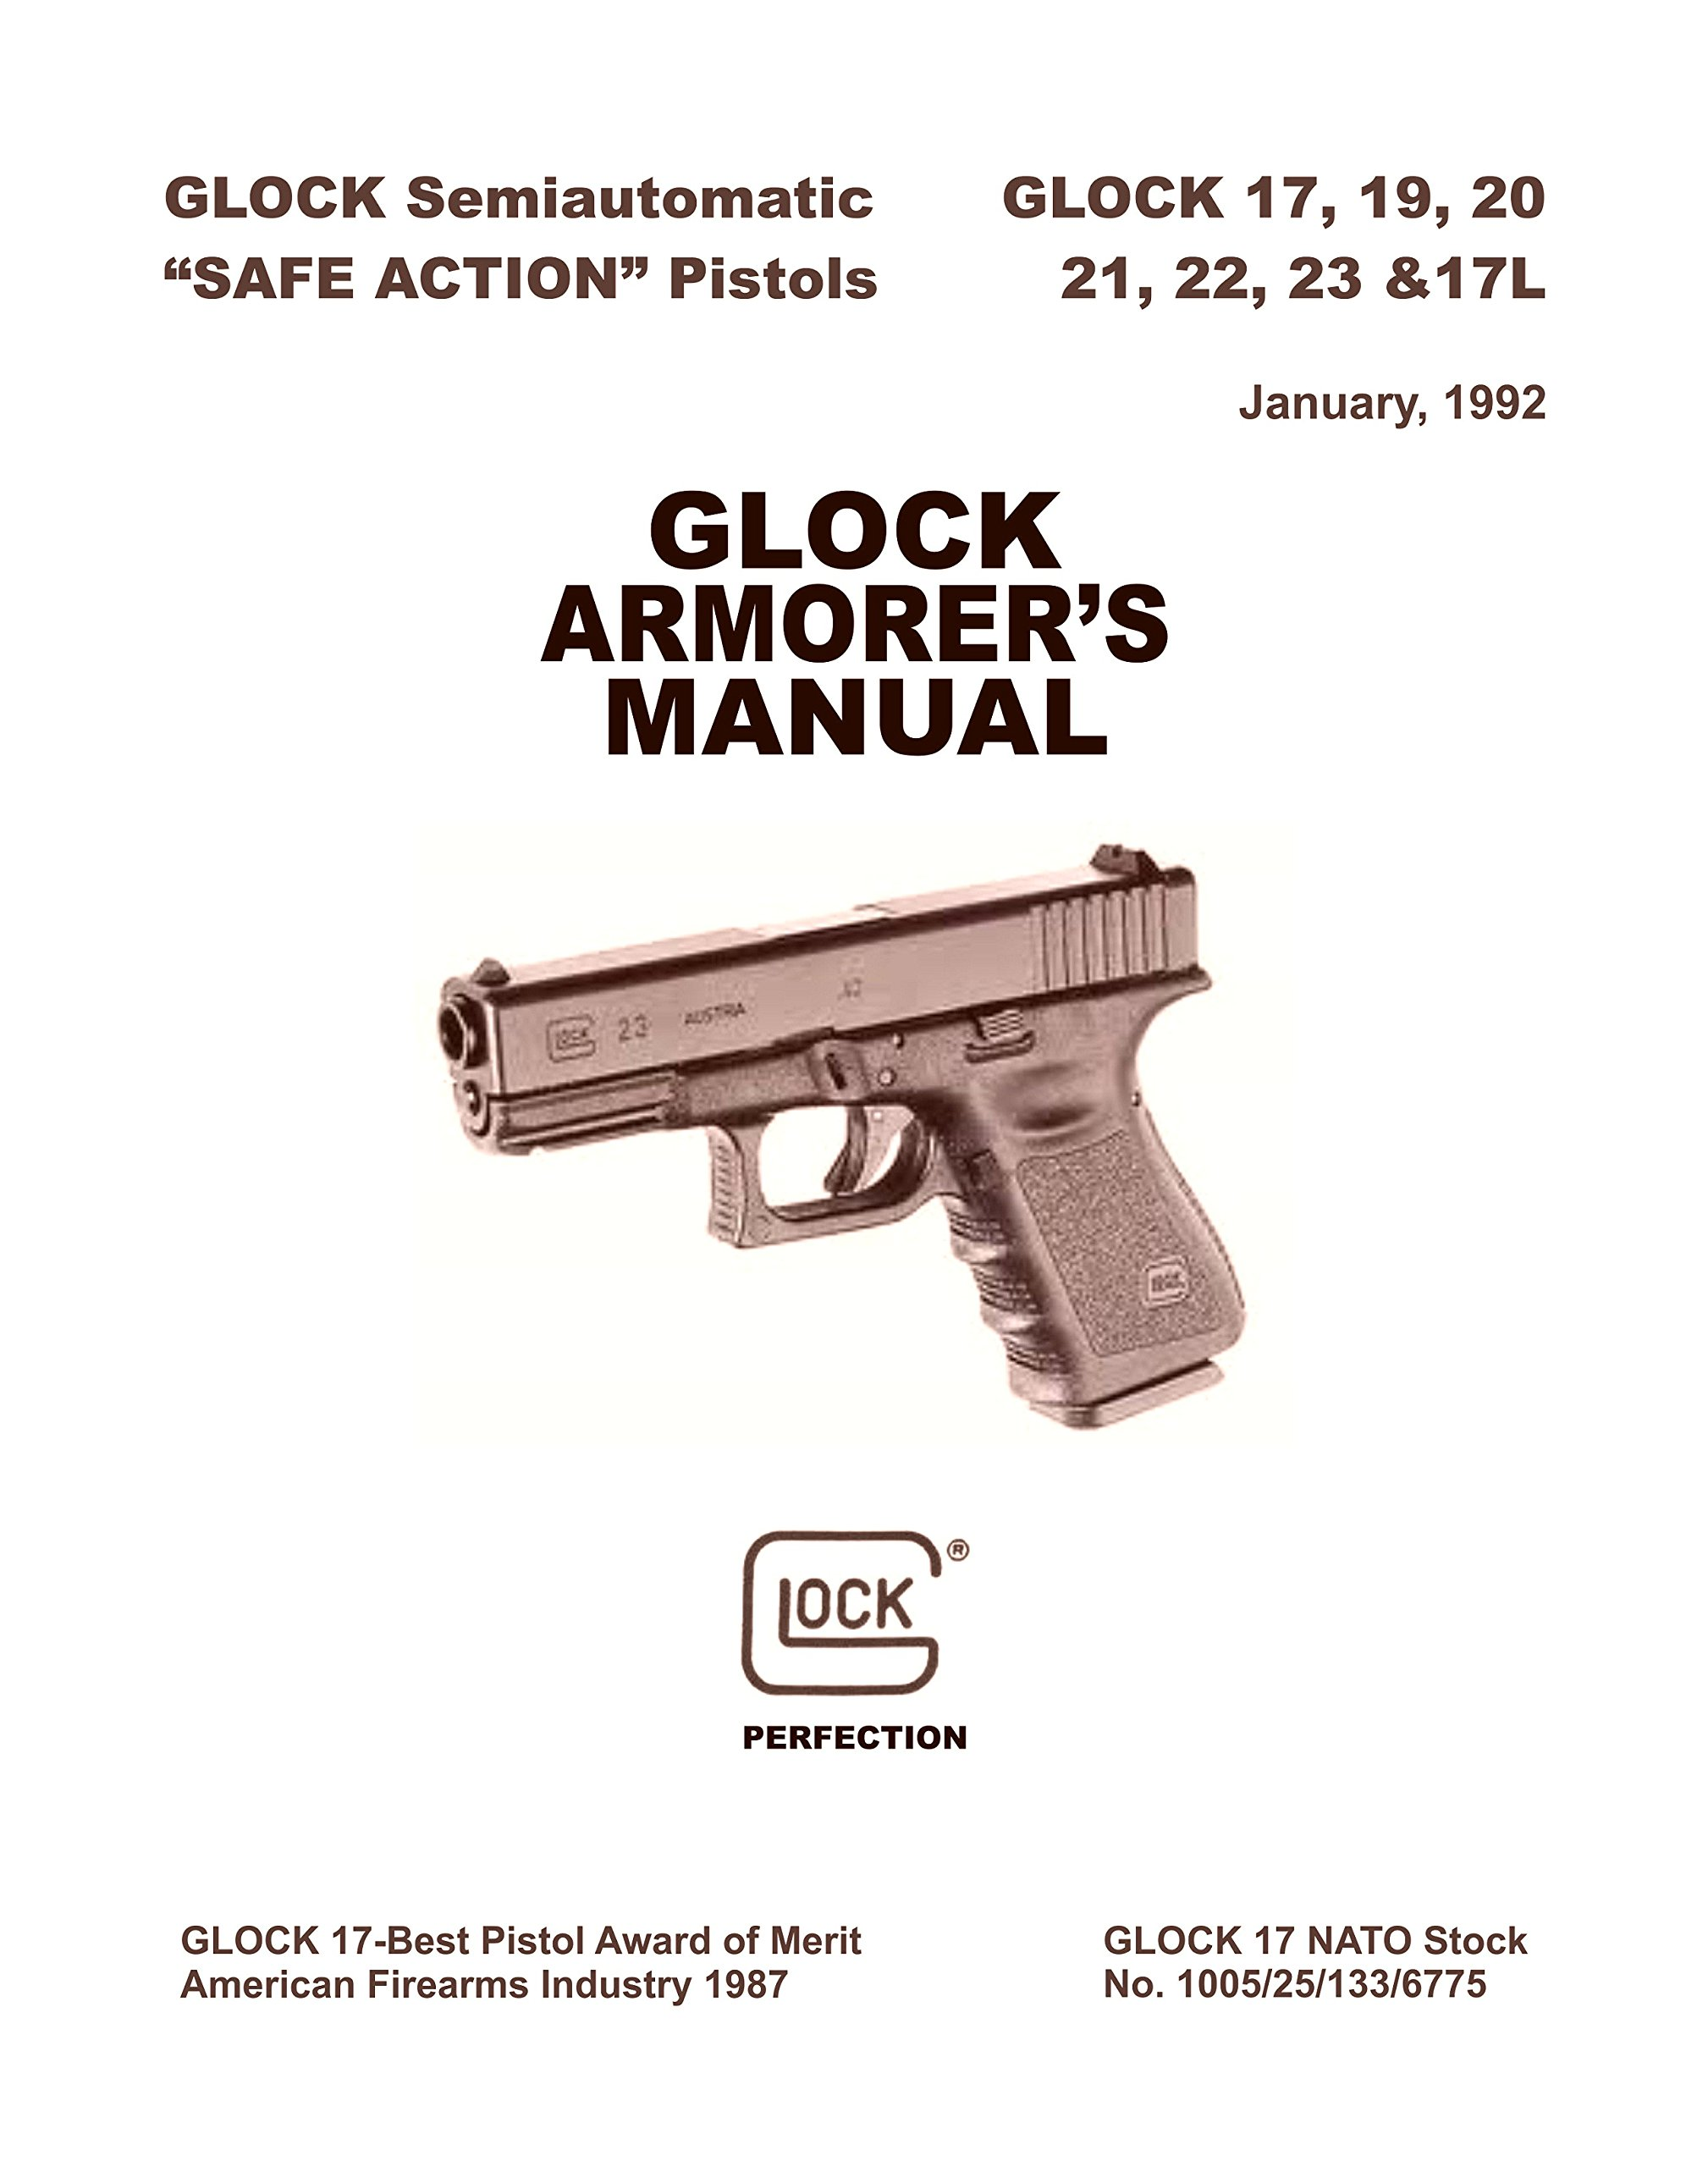 glock 17 19 20 21 22 23 17l pistol armorer s manual glock amazon rh amazon com glock 22 manual pdf glock 22 manual pdf